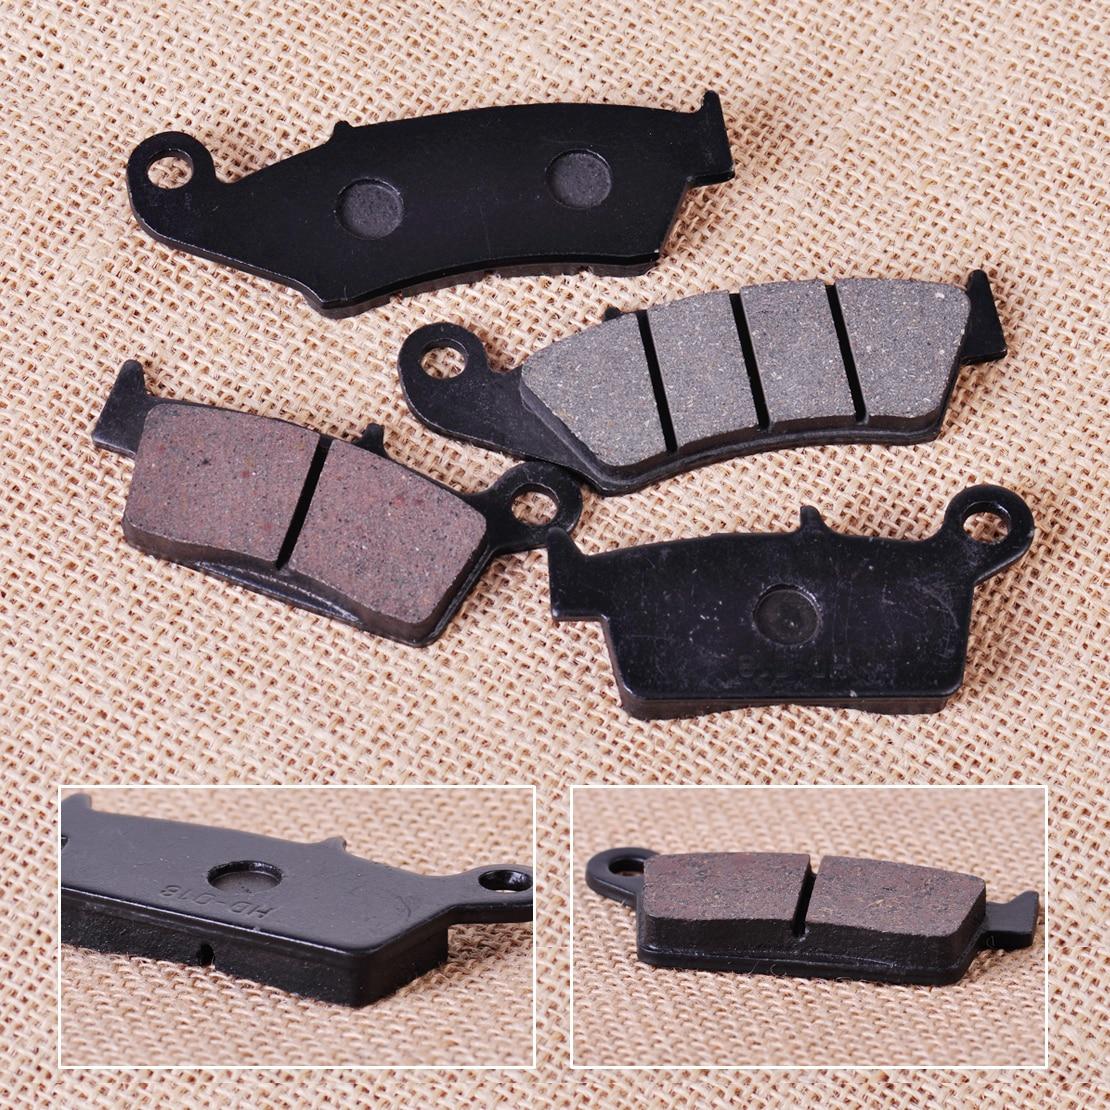 CITALL 4pcs Front & Rear Brake Pad for Kawasaki KX125 KX250 Suzuki RM125 DR-Z400E Honda CR250R CR125R Yamaha YZ125 WR250F YZ400F rm dr rm z 125 250 350 400 450 650 front brake pads